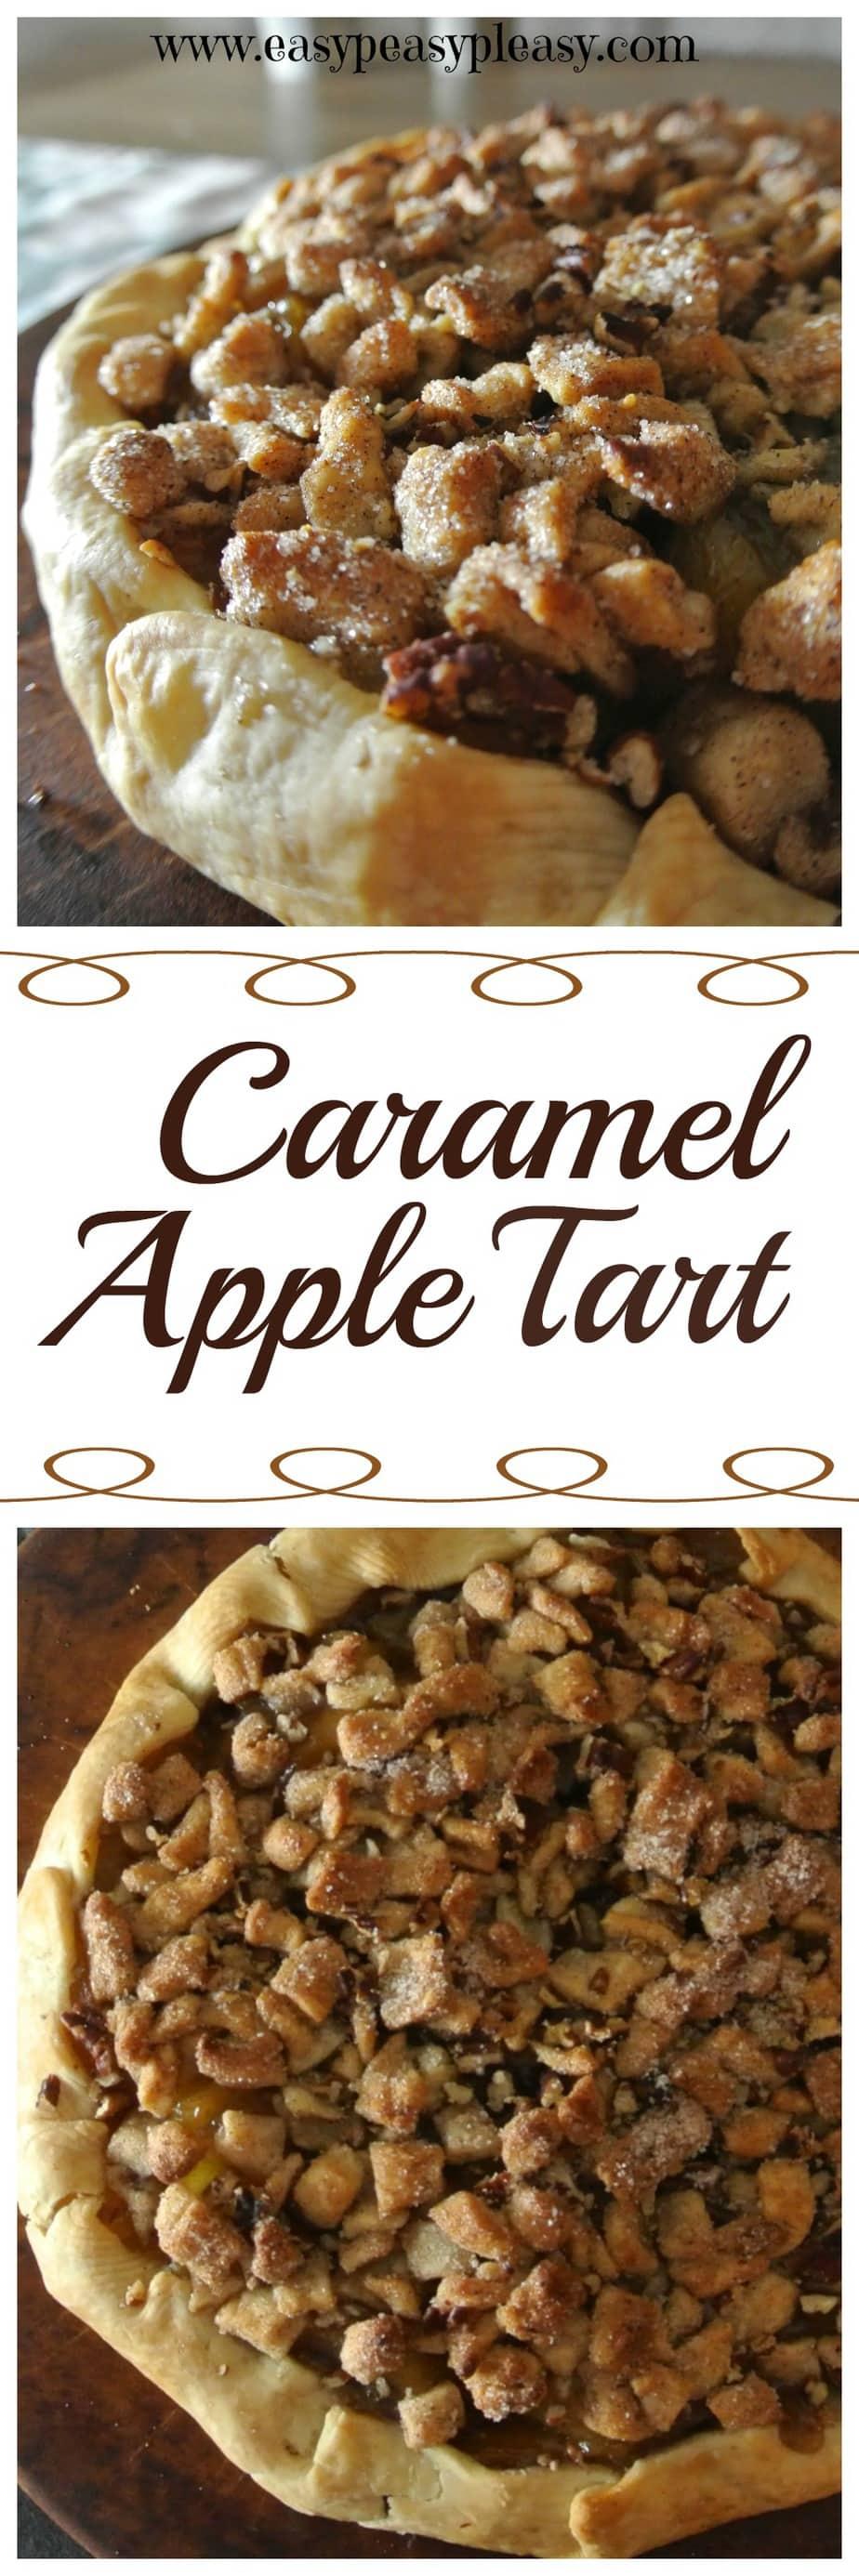 Easy 5 Ingredient Caramel Apple Streusel Tart!